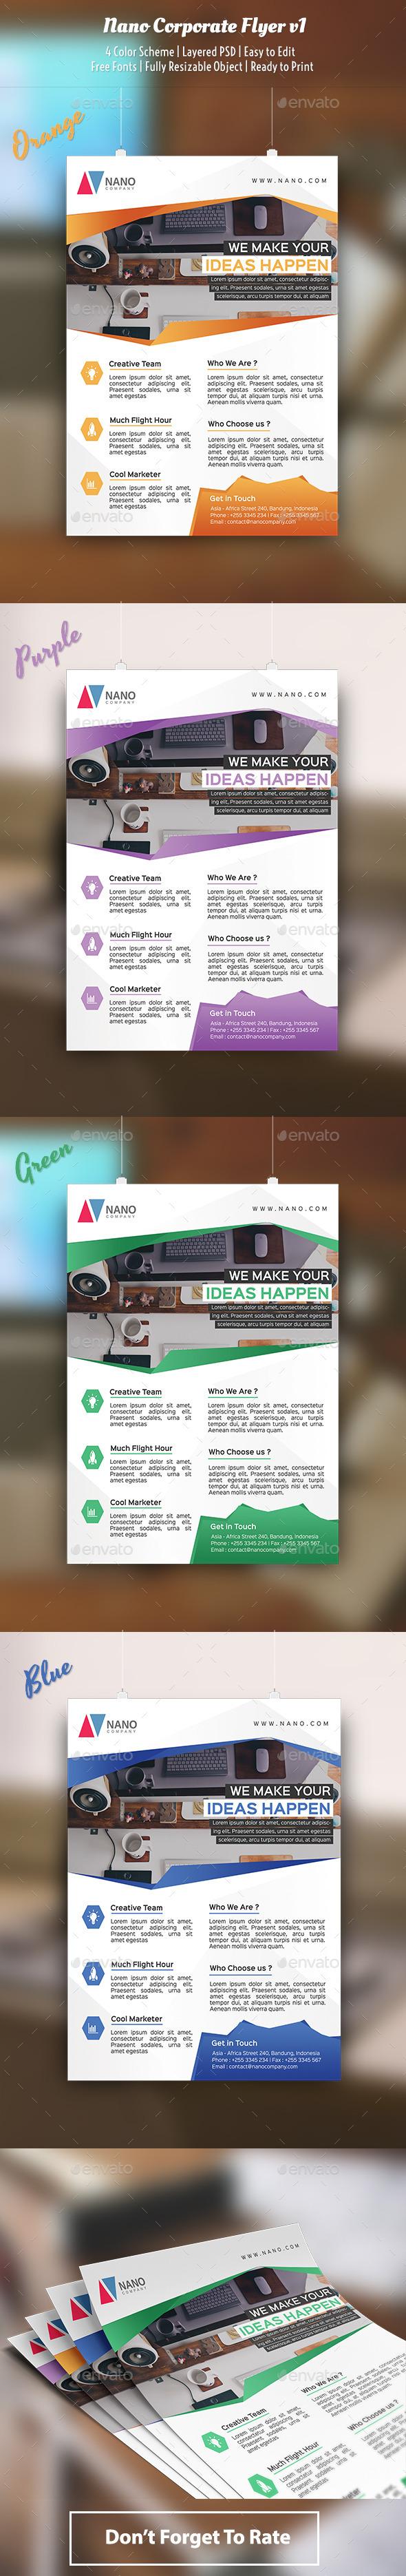 Nano Flyer Template v1 - Corporate Flyers